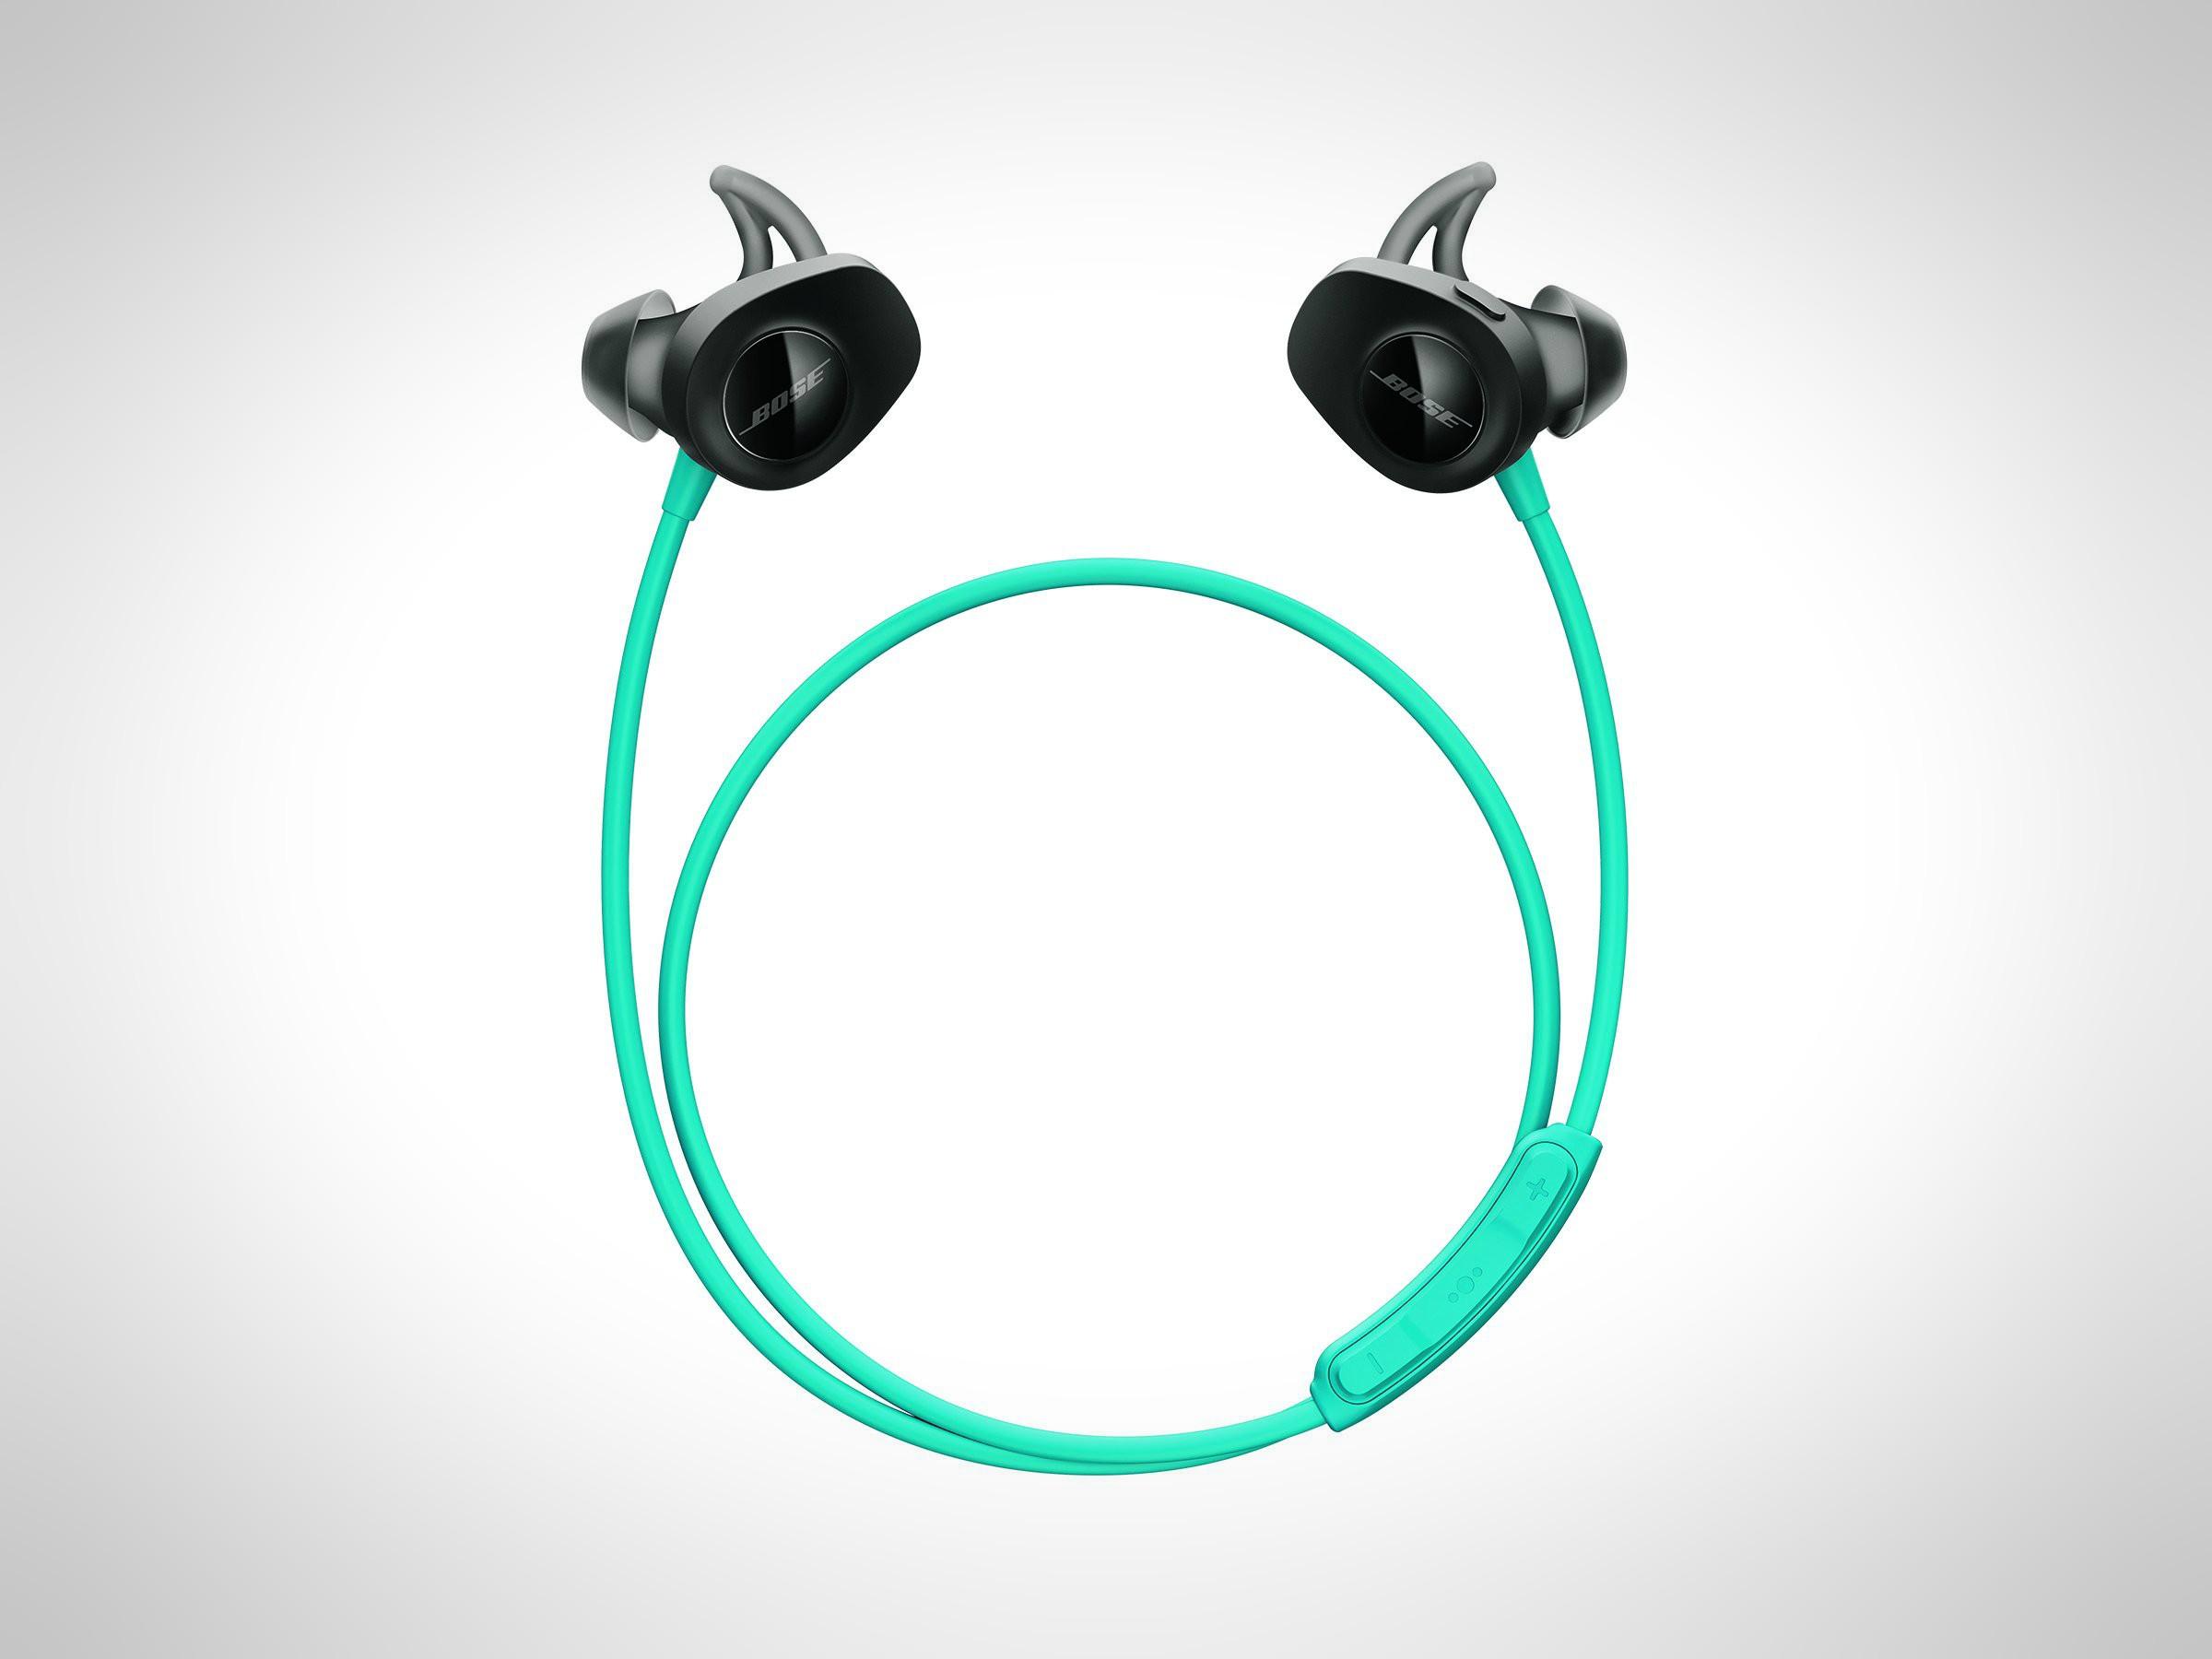 gym-clothes-for-men-workout-gear-earphones-bose